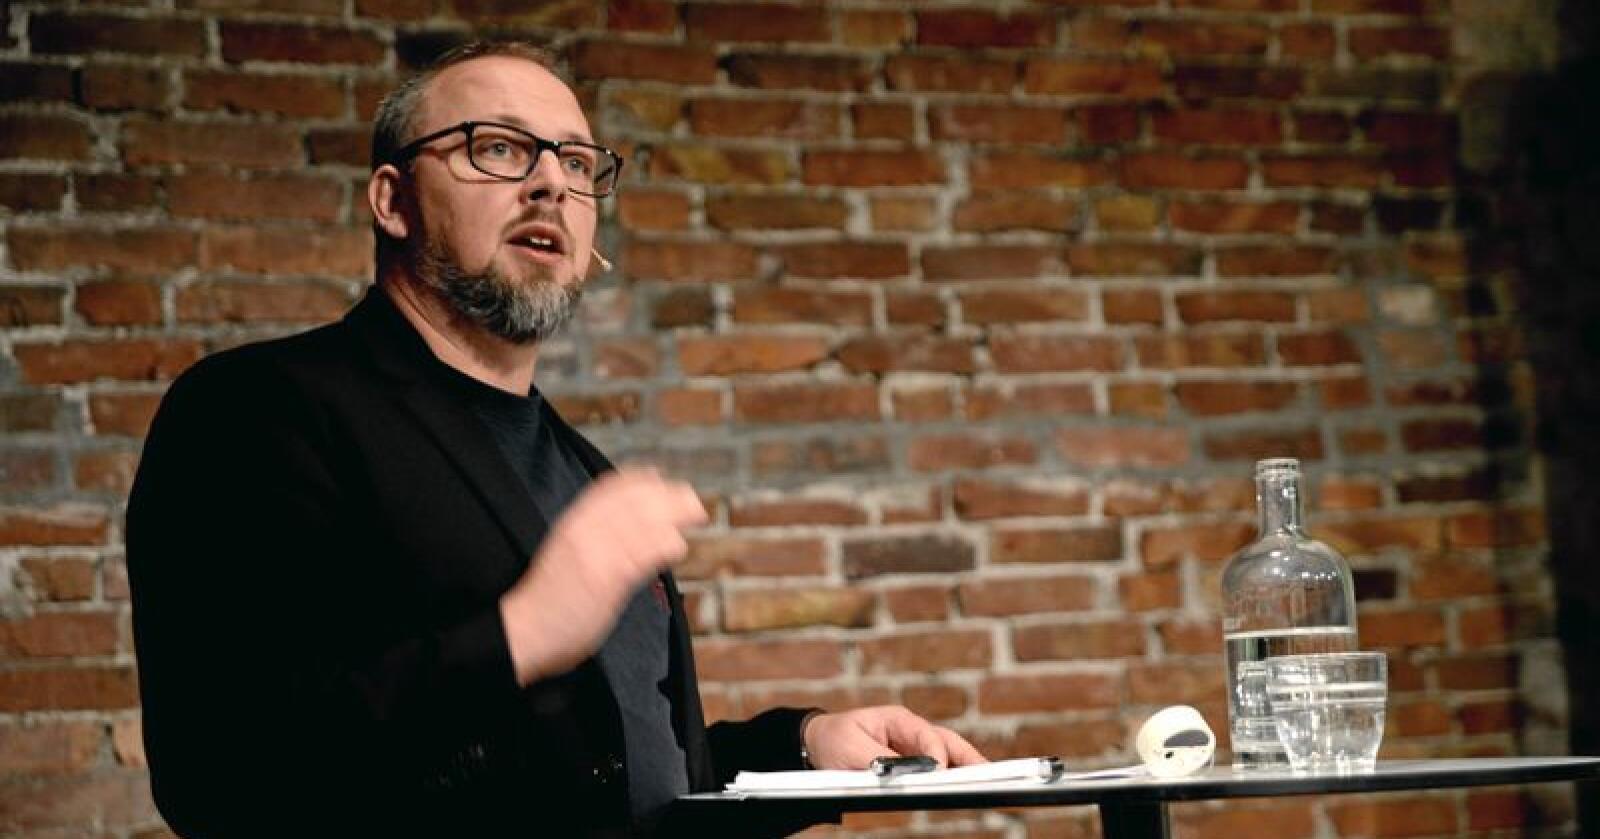 Politisk redaktør i Nationen Kato Nykvist tar feil om Civita, skriver Lars Kolbeinstveit i Civita. Foto: Mariann Tvete